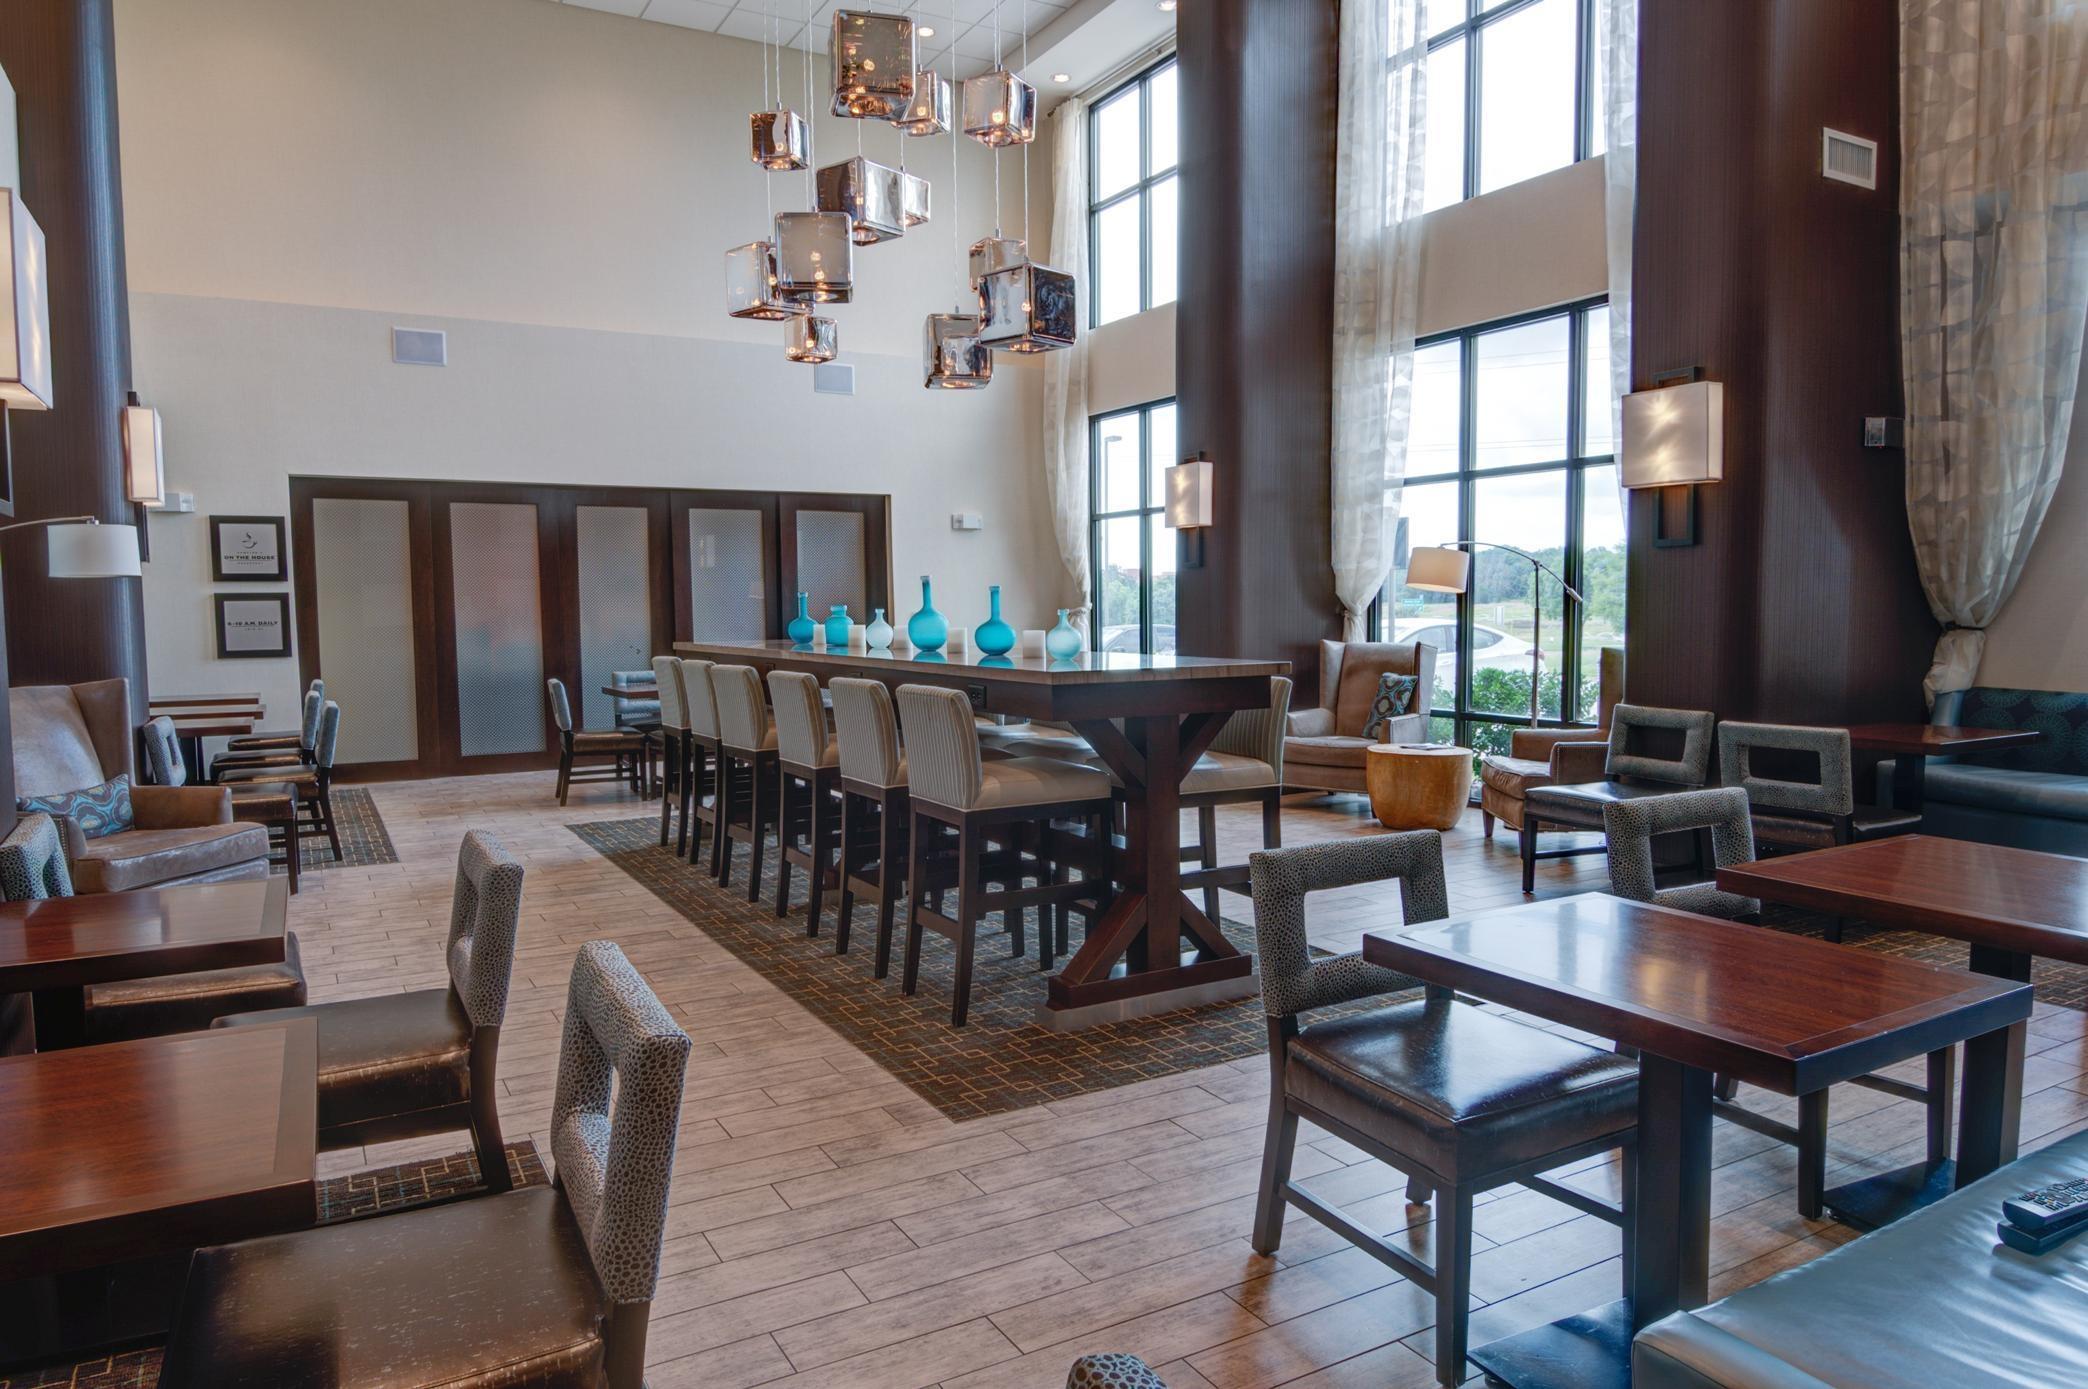 Hampton Inn & Suites Trophy Club - Fort Worth North image 6